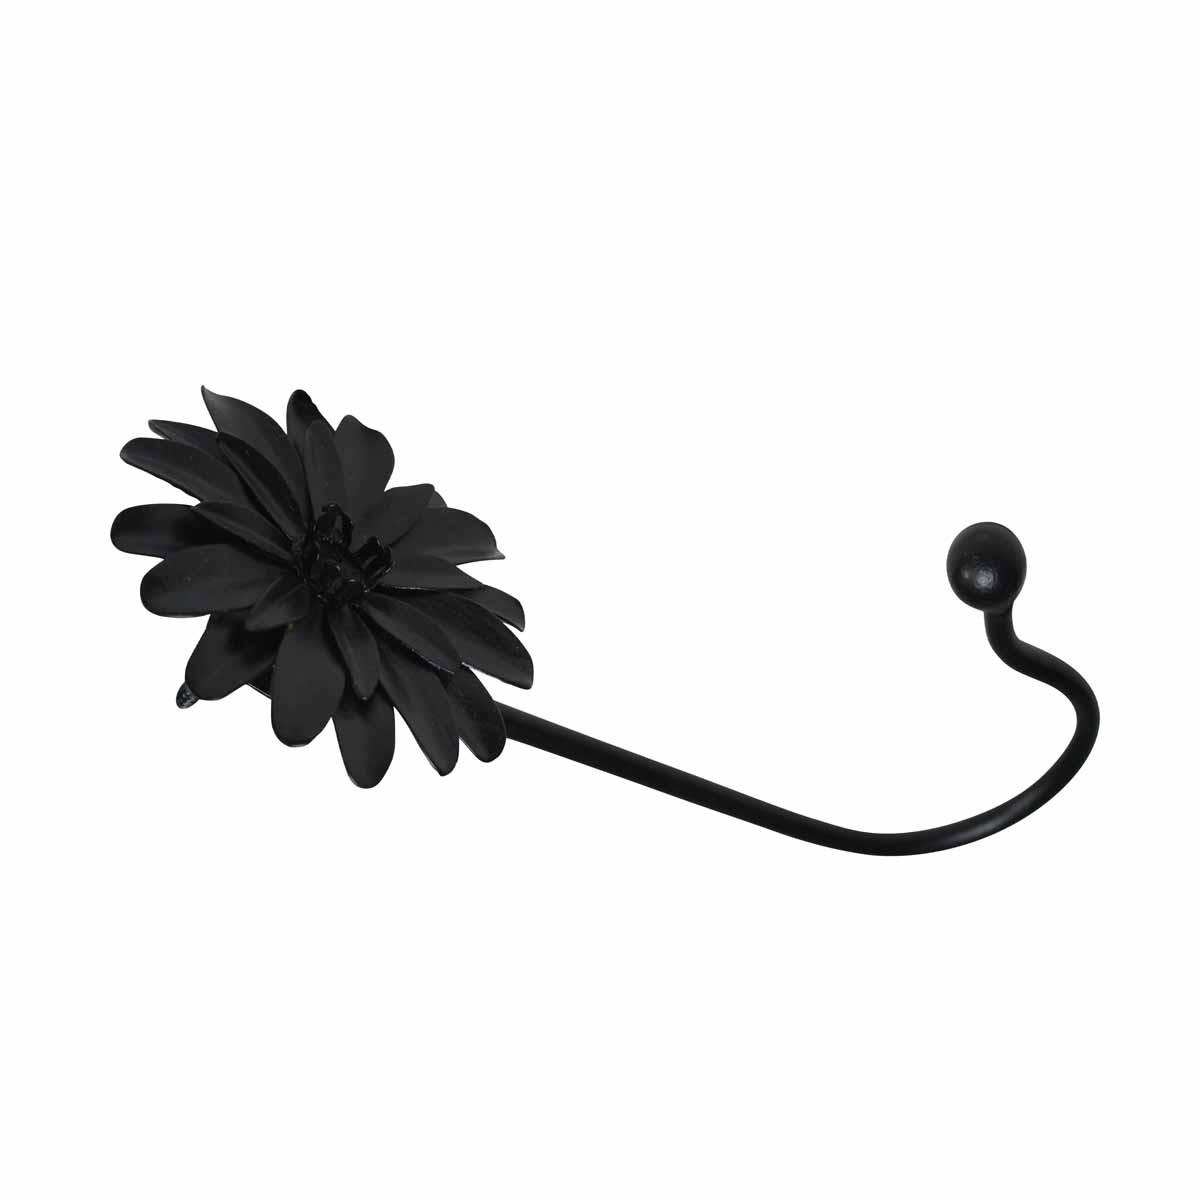 Flower Hook Wrought Iron Black Zinnia  7 H X 3 Proj Hooks Decorative Hook Coat Hook